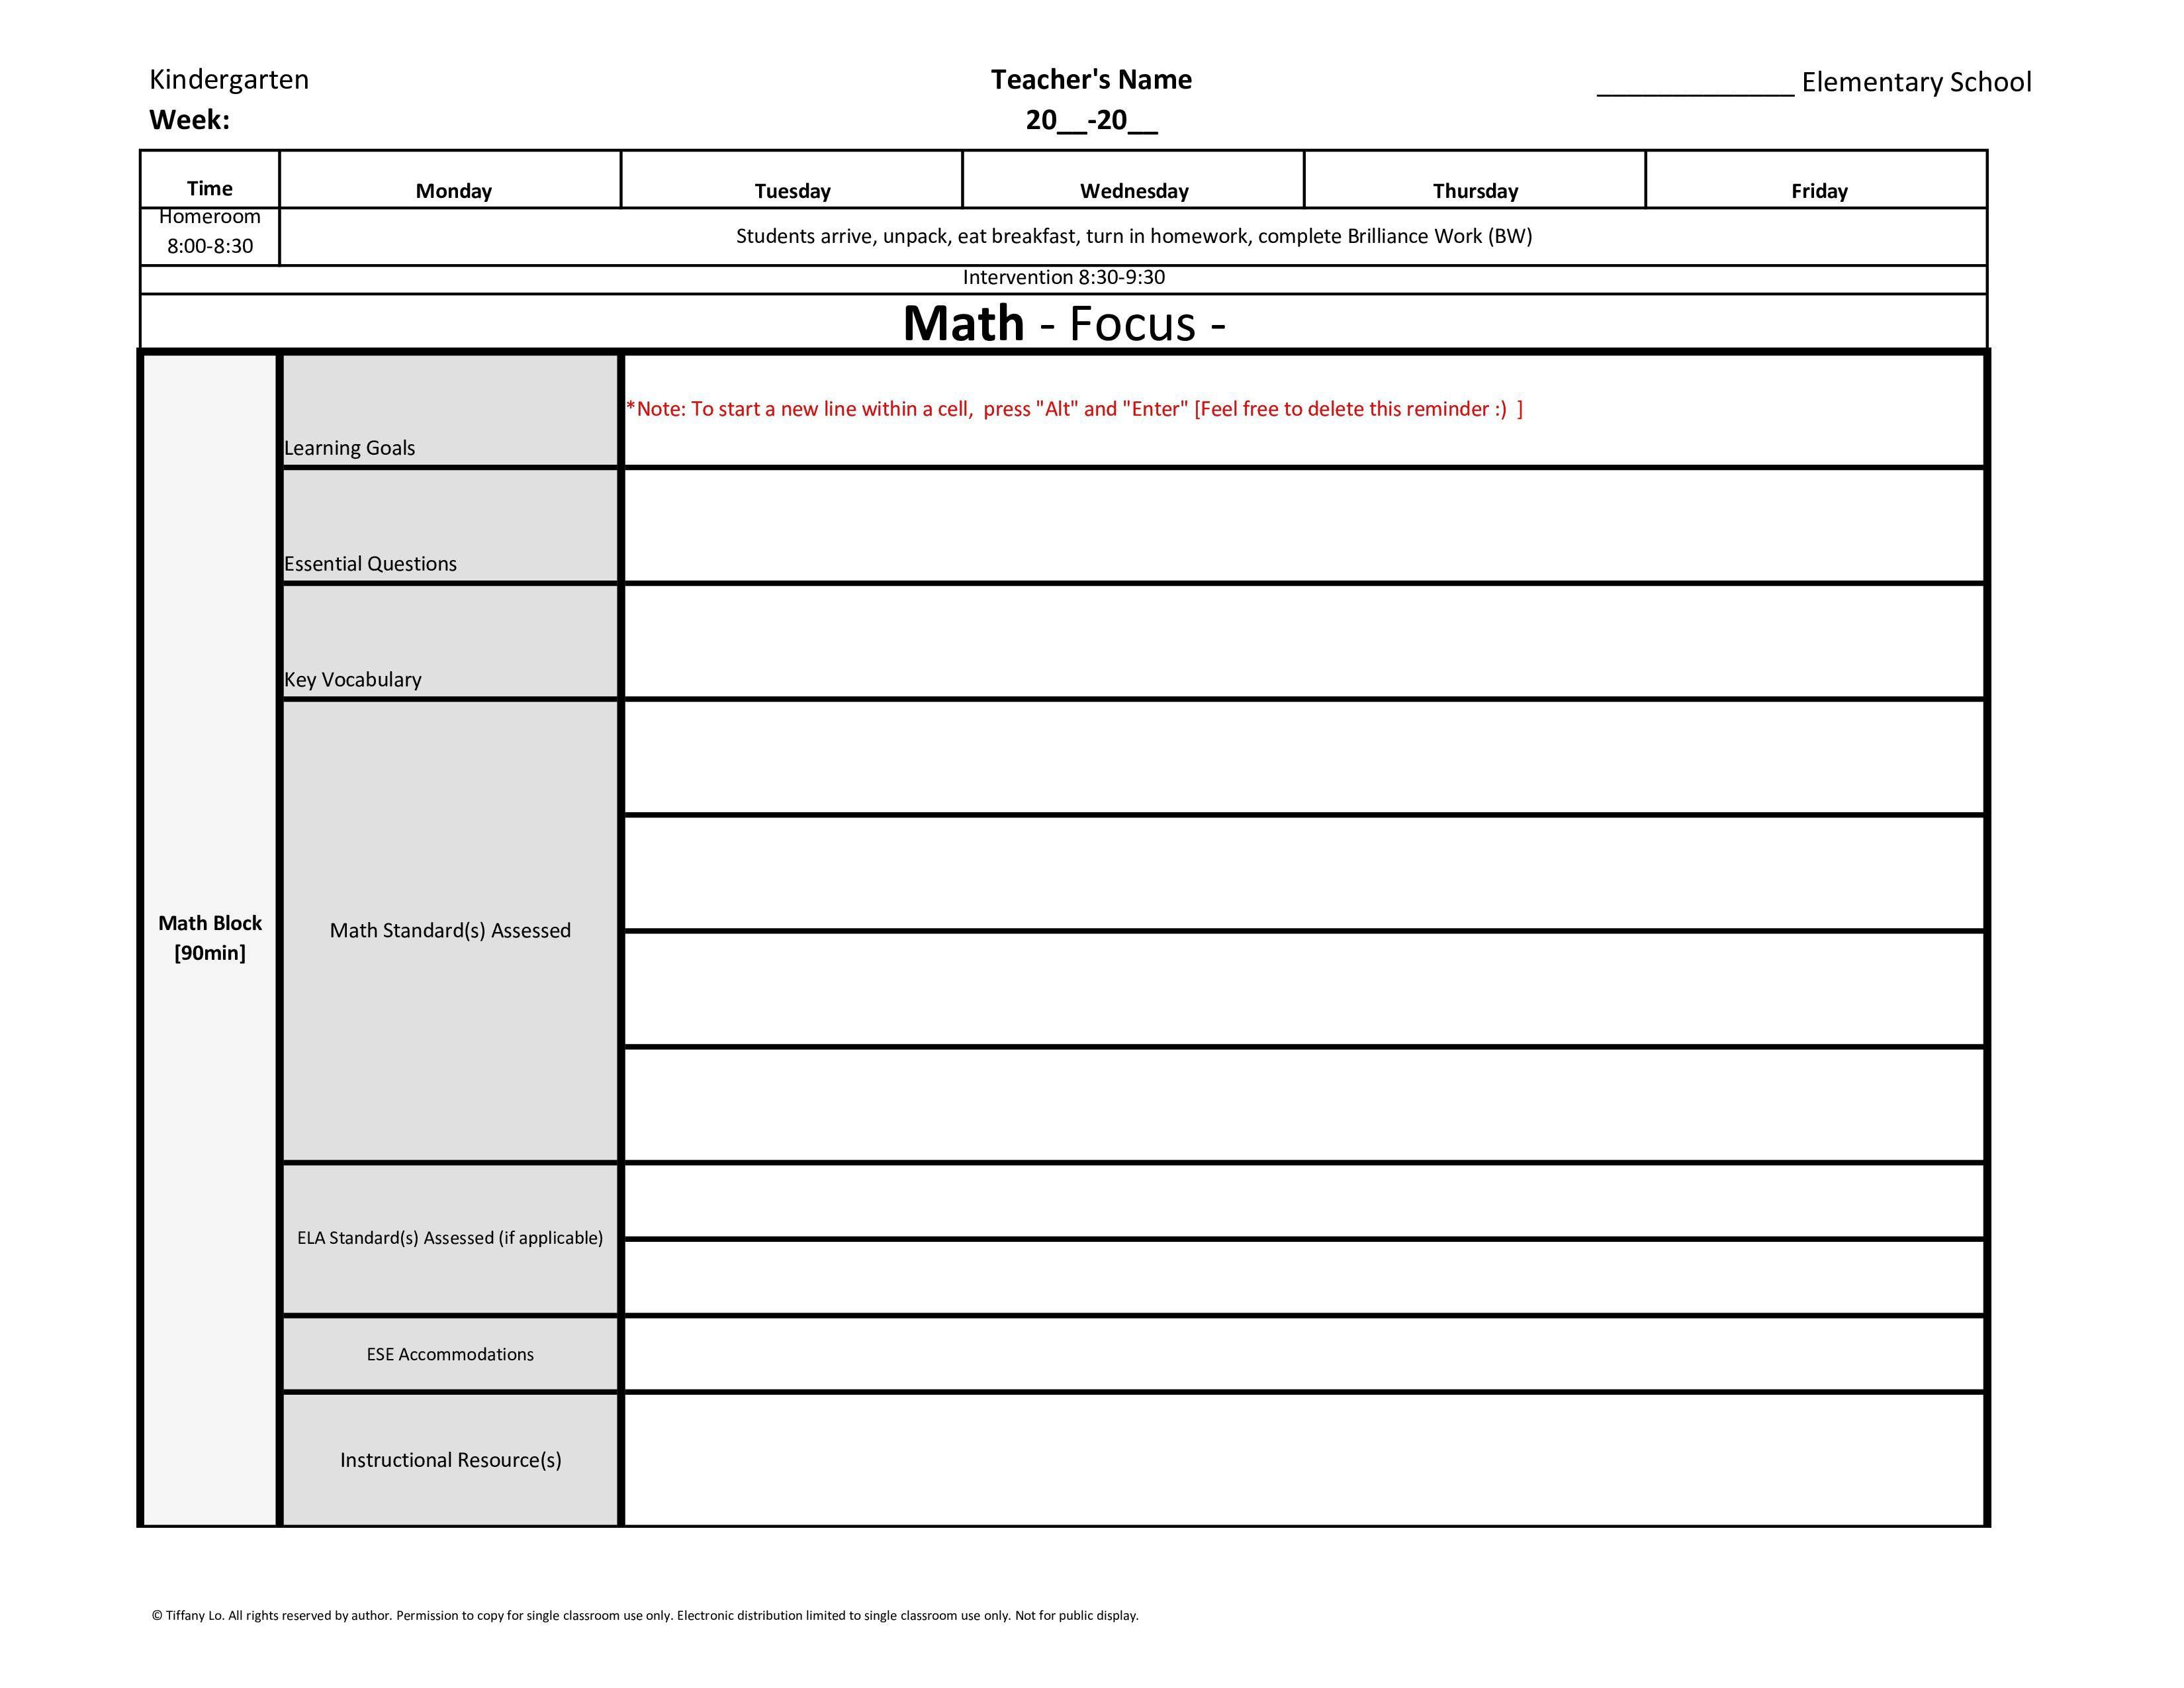 002 Impressive Lesson Plan Template For Kindergarten Common Core Photo Full